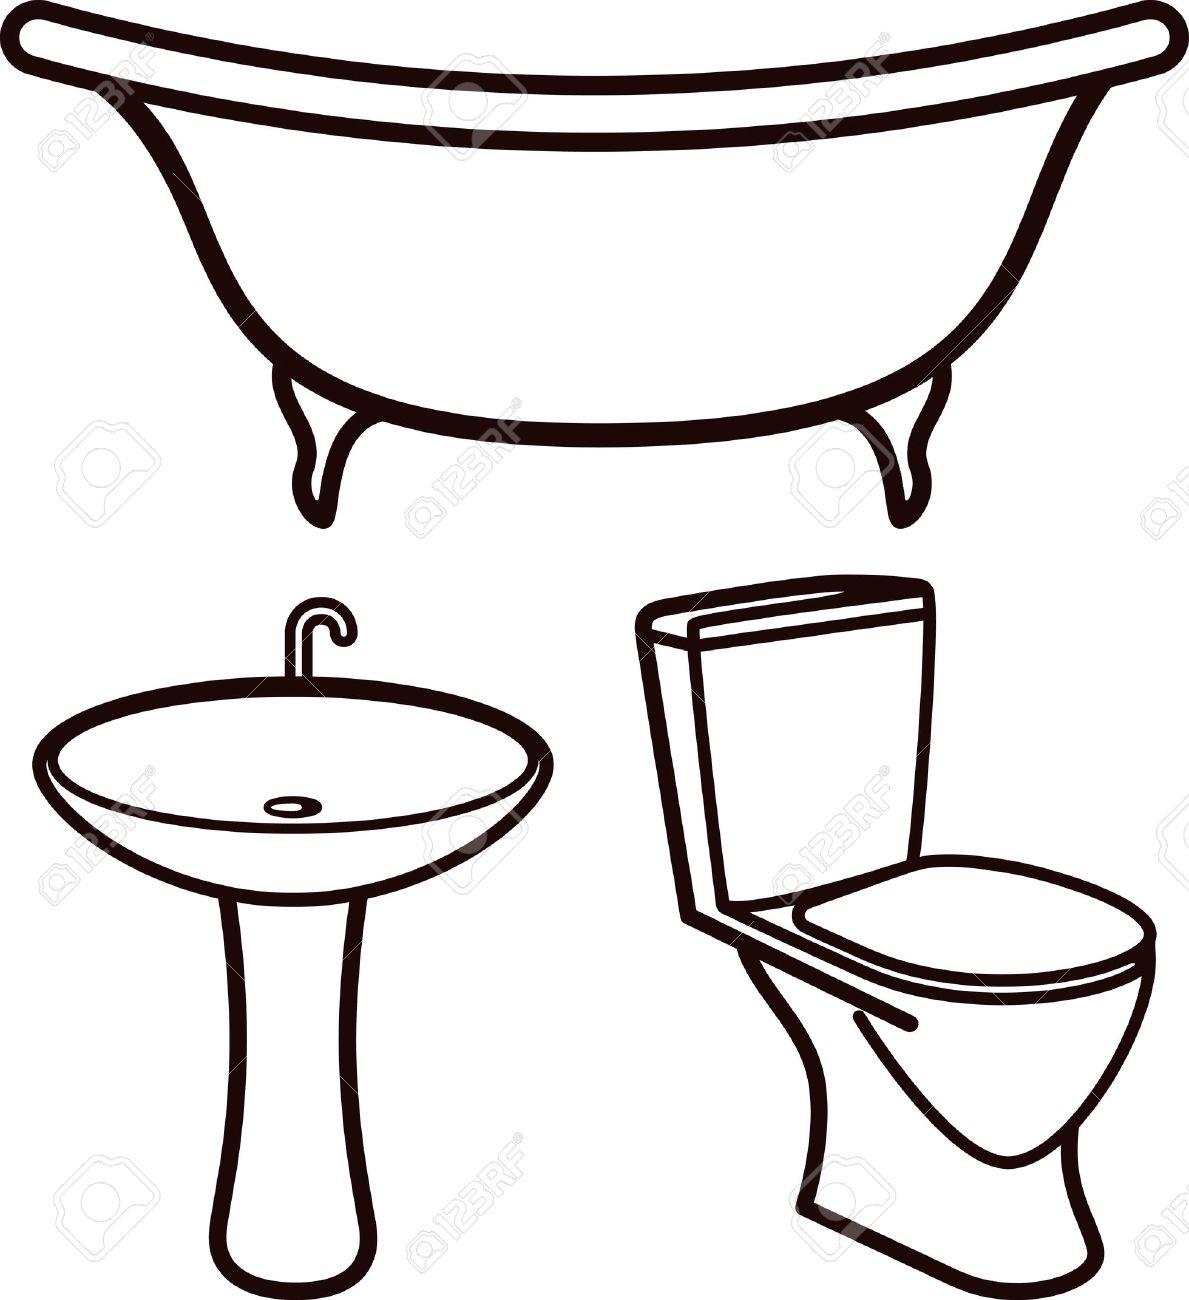 1189x1300 Inspirational Bathroom Sink Clipart Explore Pictures Clip Art